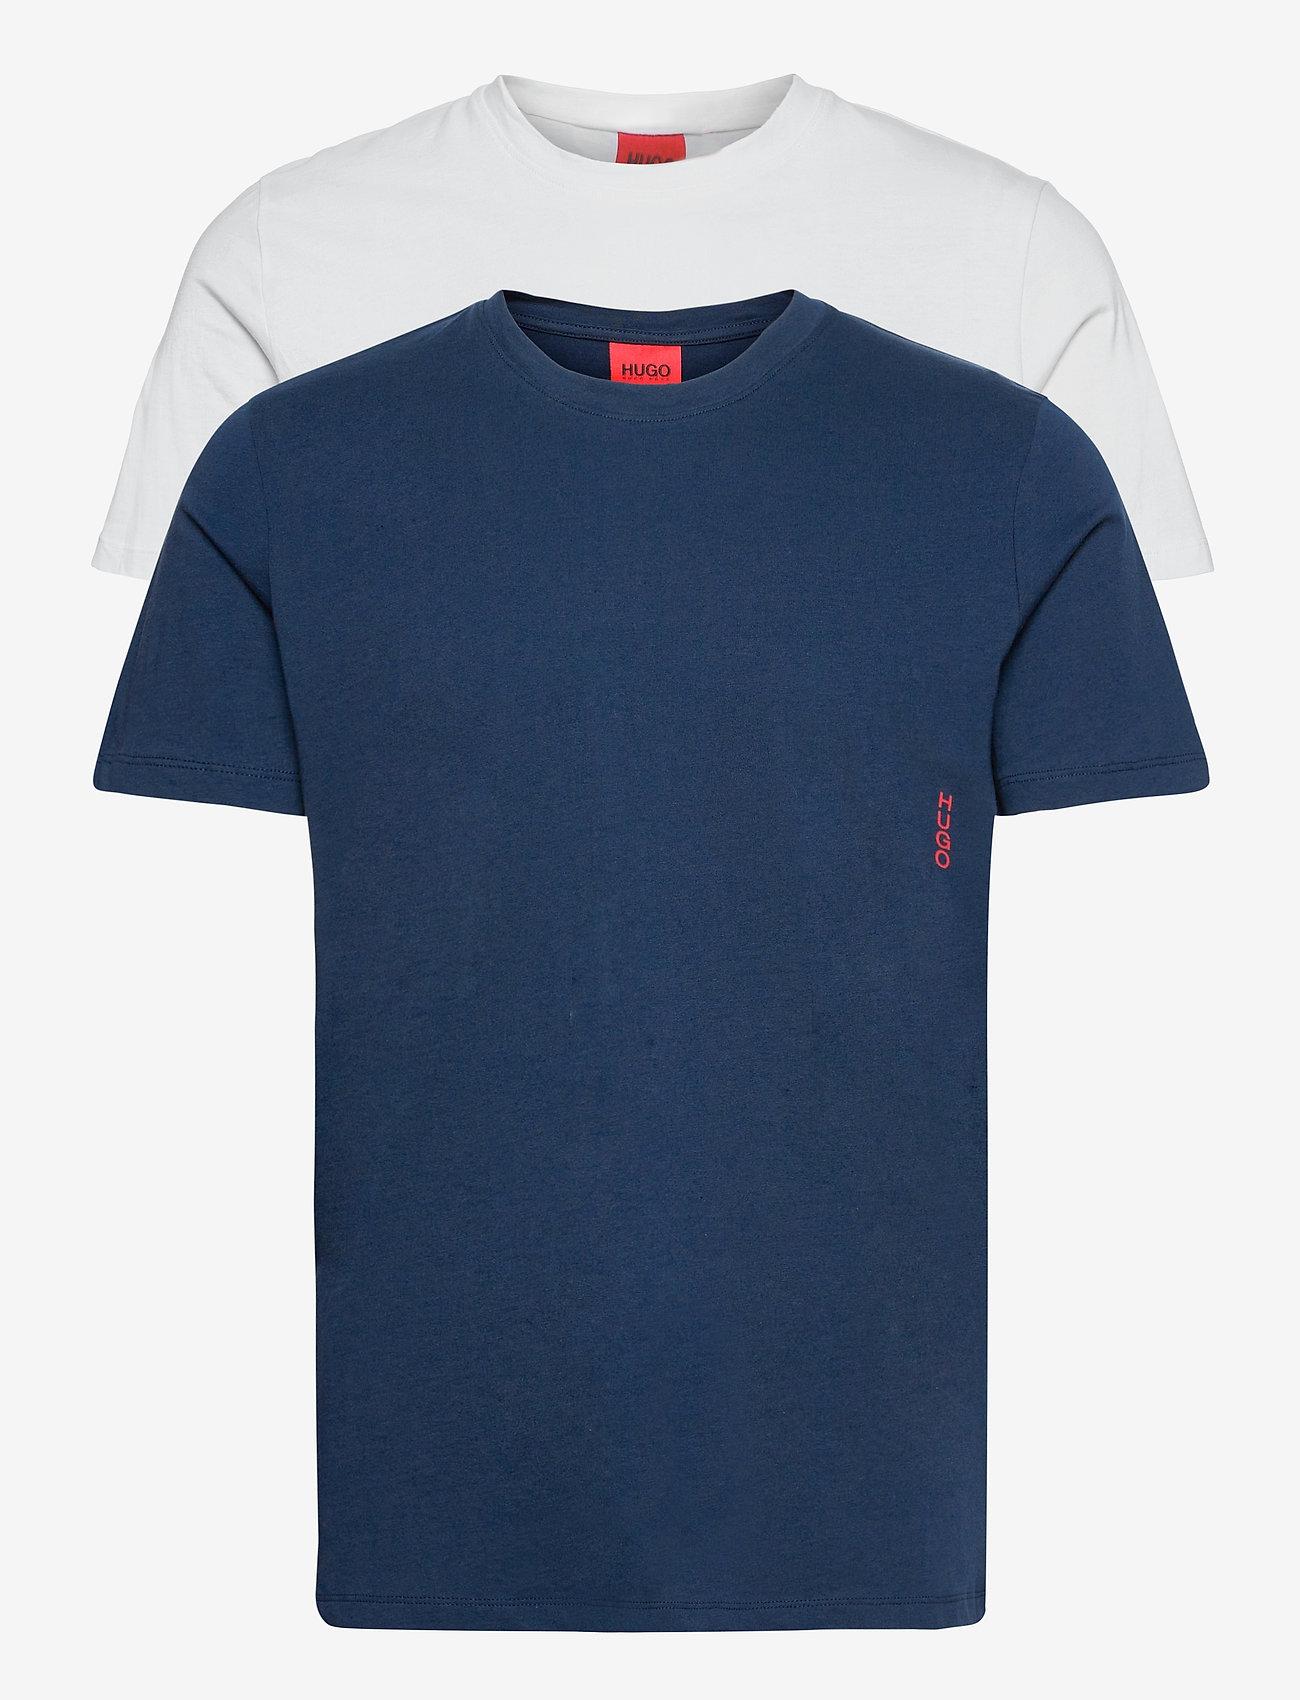 HUGO - T-SHIRT RN TWIN PACK - multipack - open blue - 0